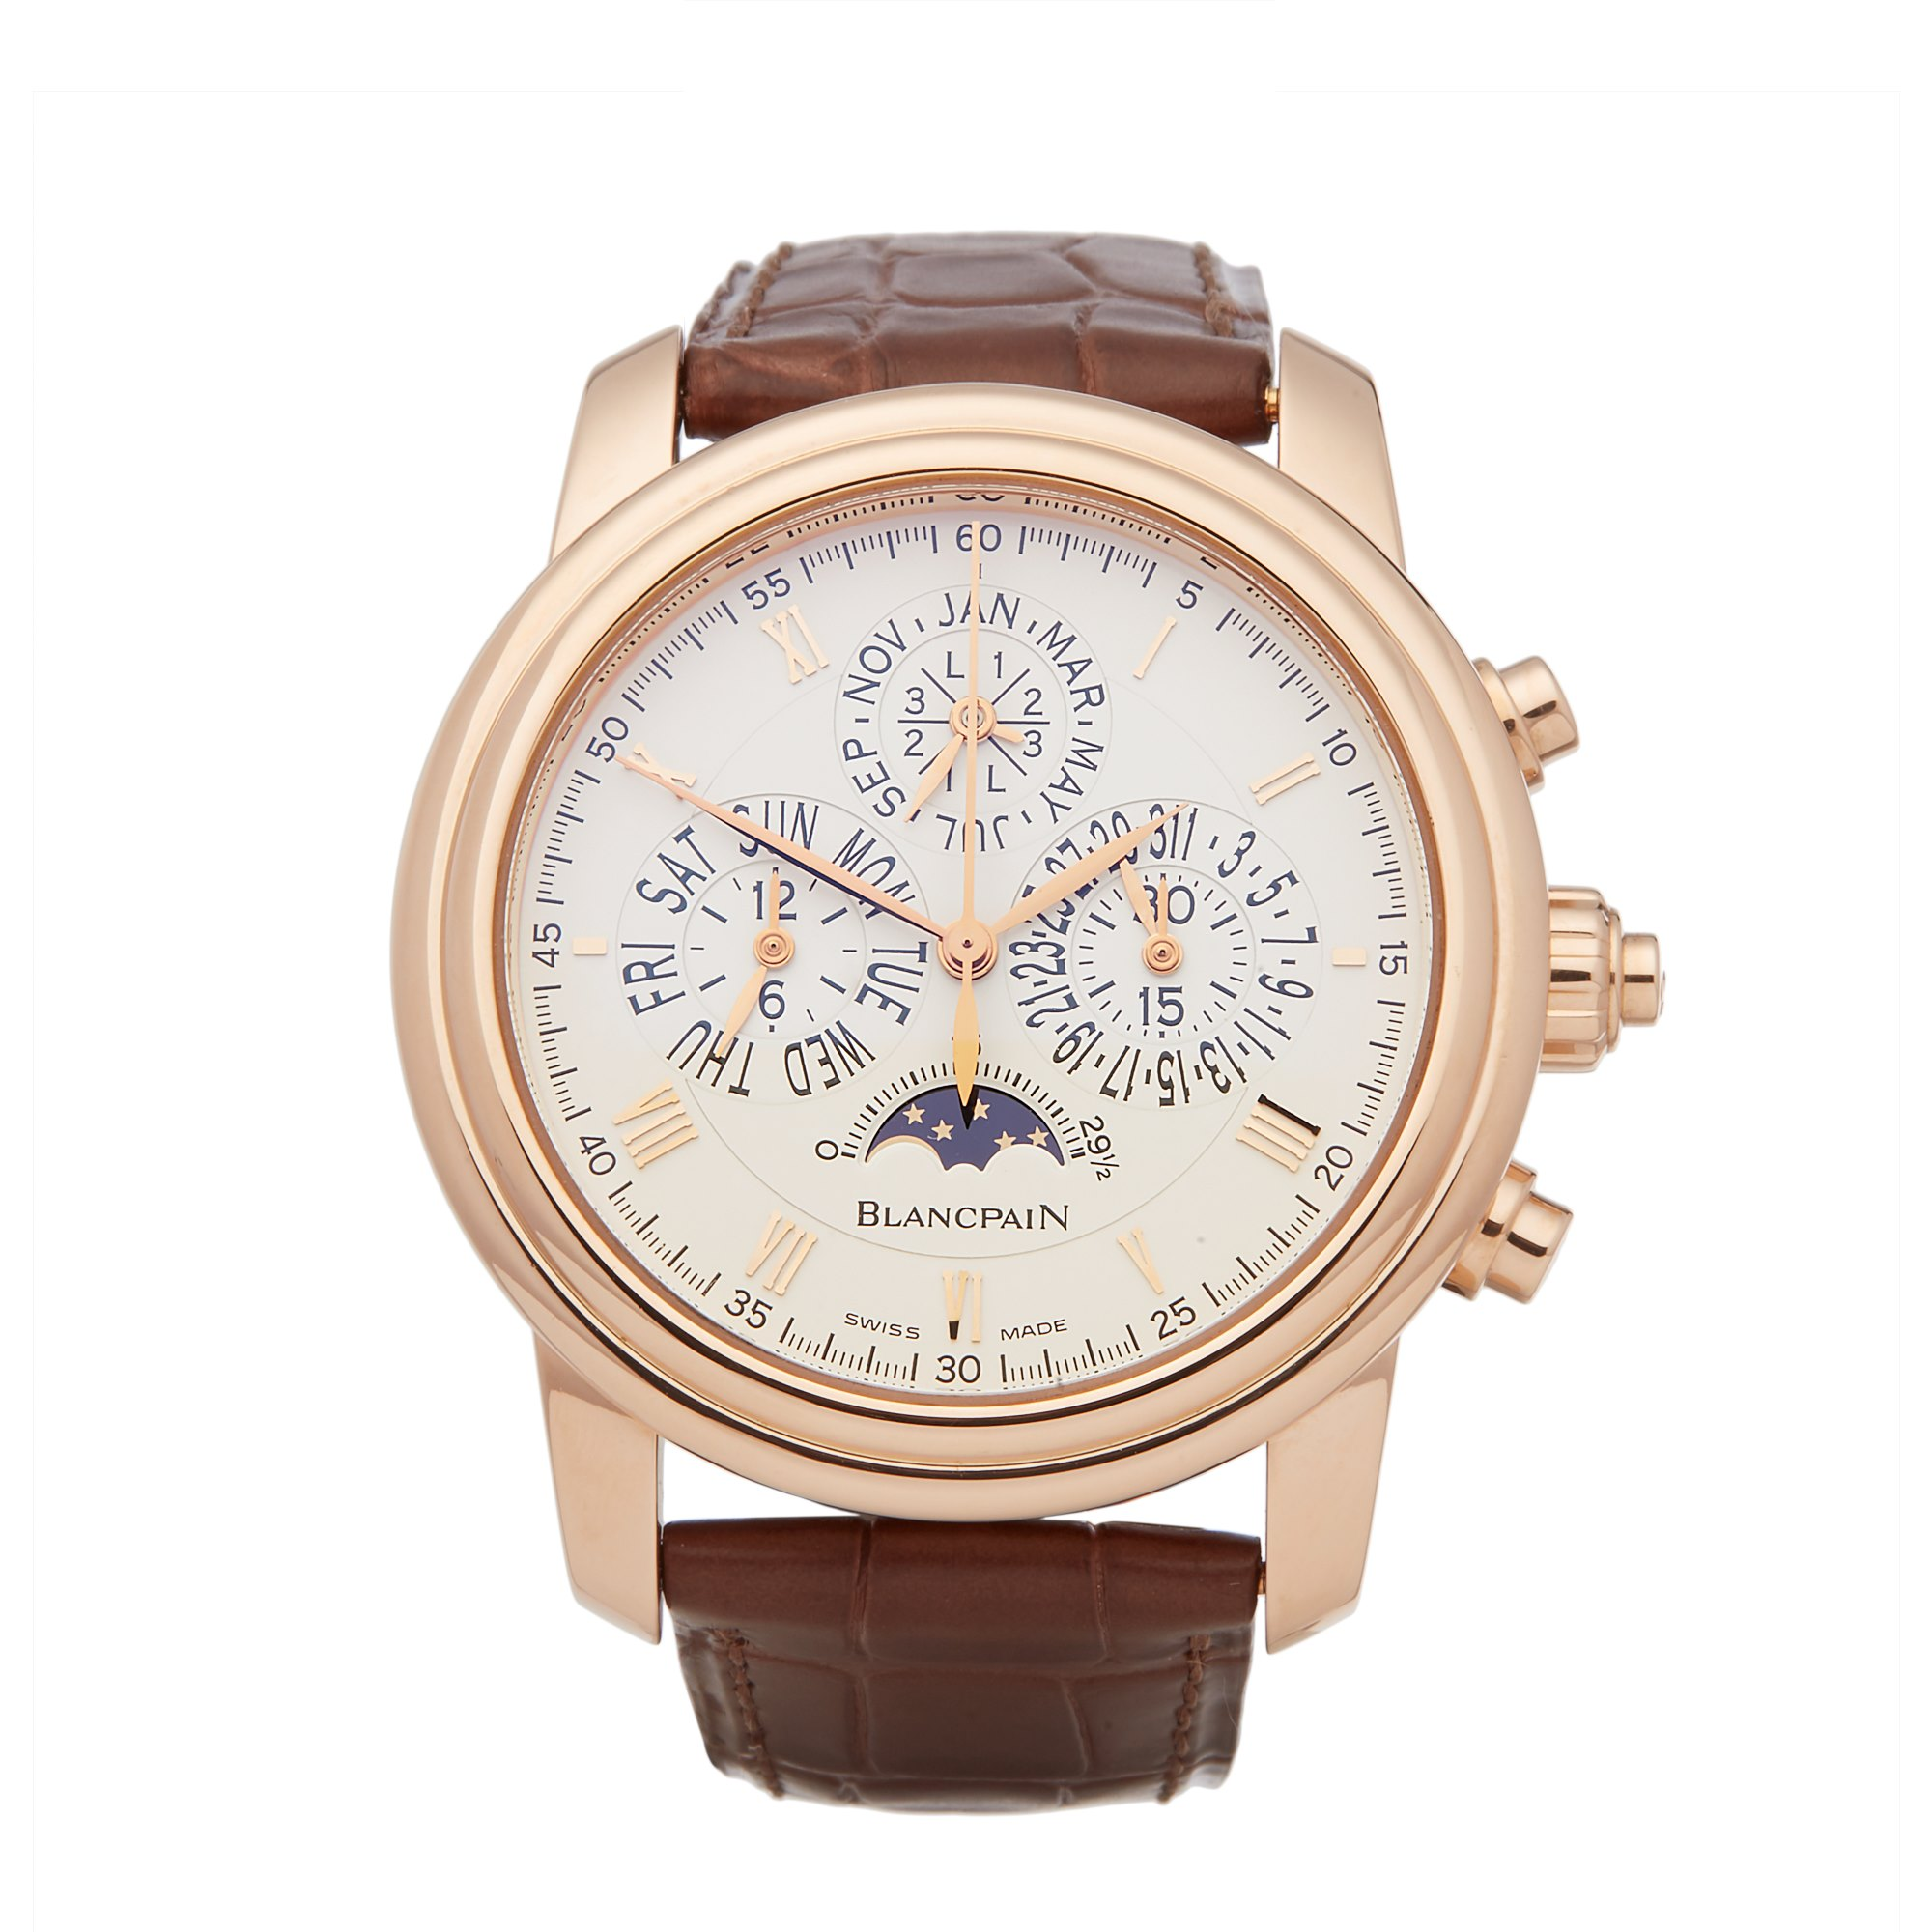 Blancpain Le Brassus Perpetual Calendar Split Seconds Chronograph 18K Rose Gold 4286P-3642-55B